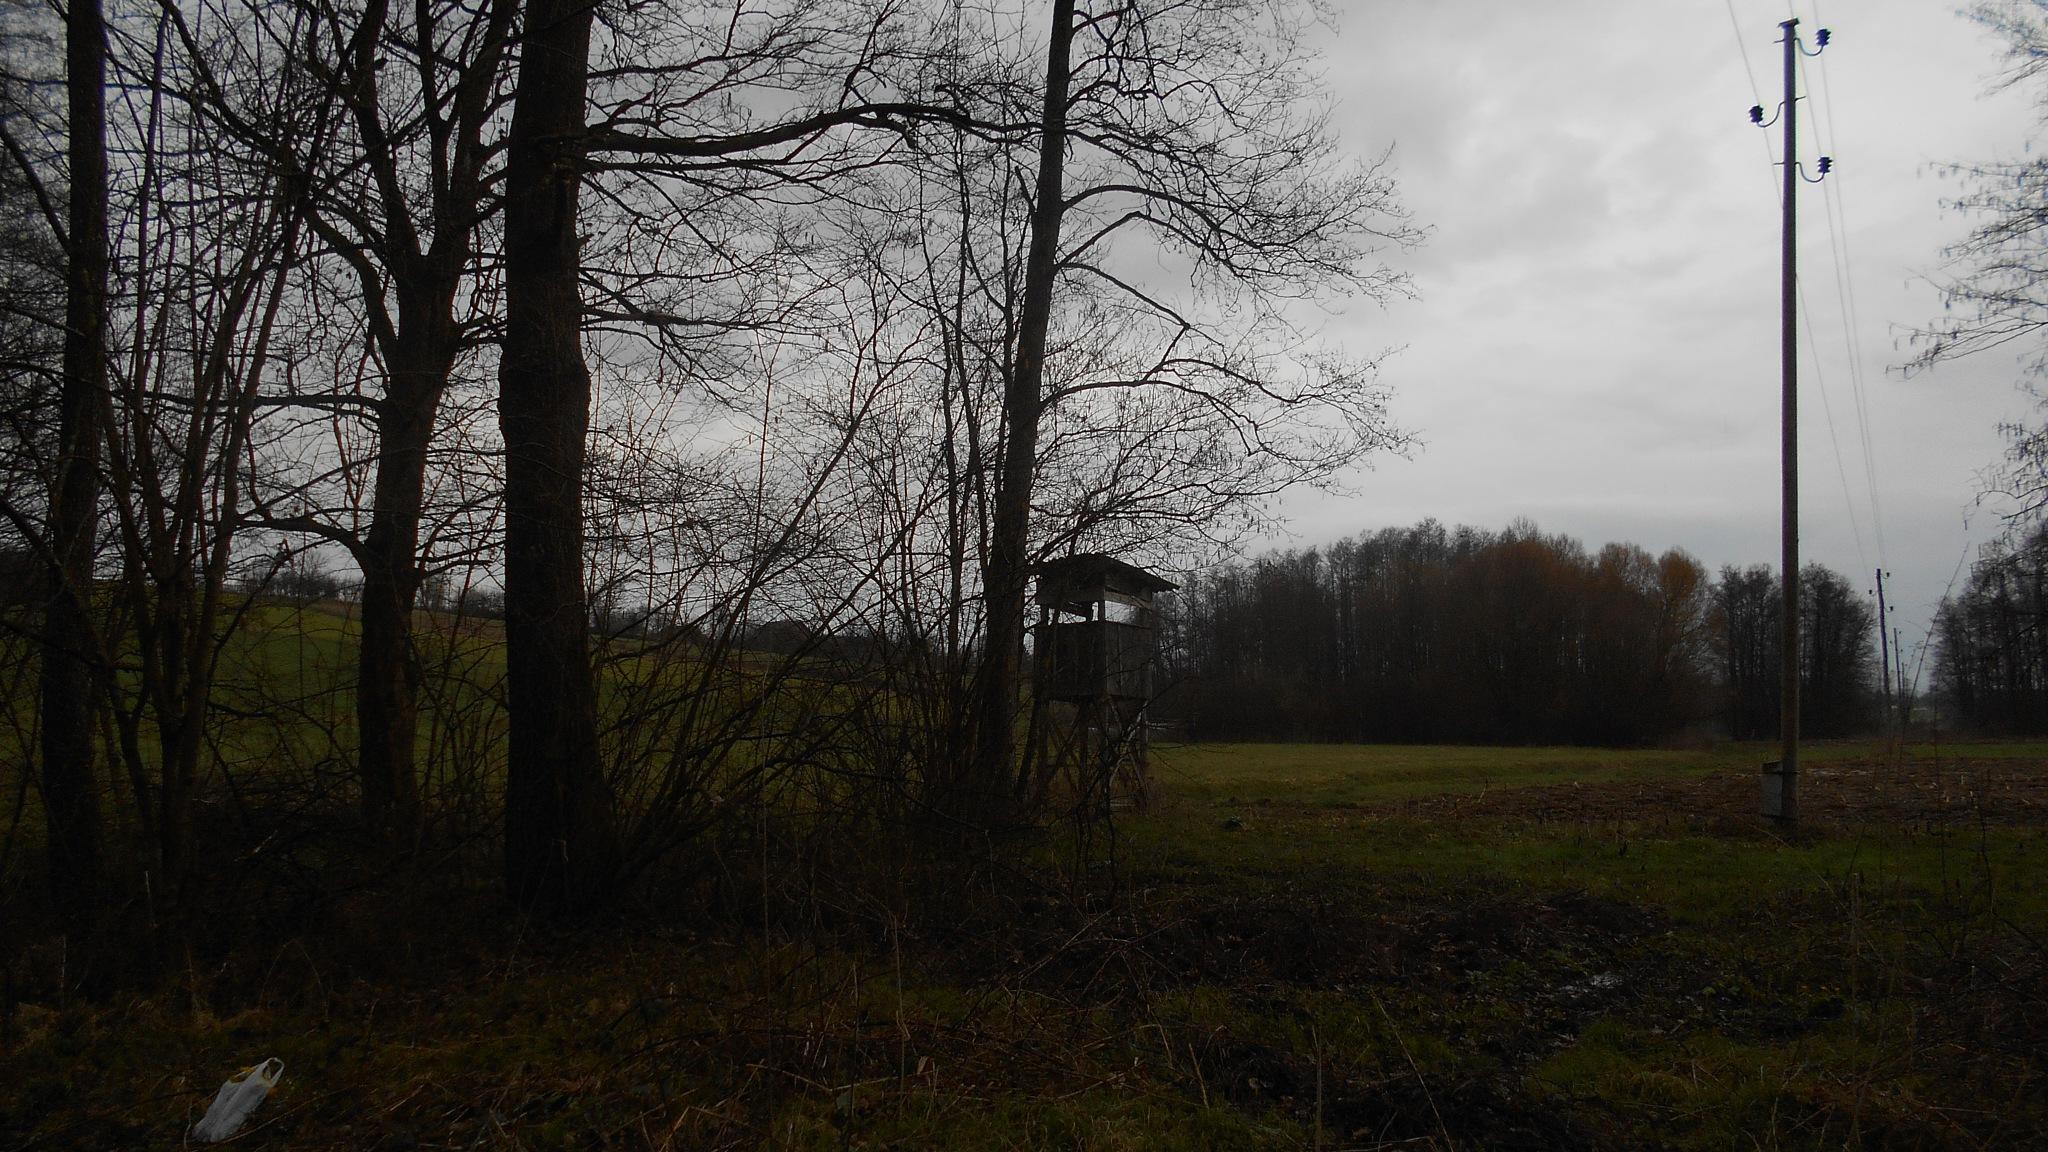 Na rubu šume-čeka! by Mary13